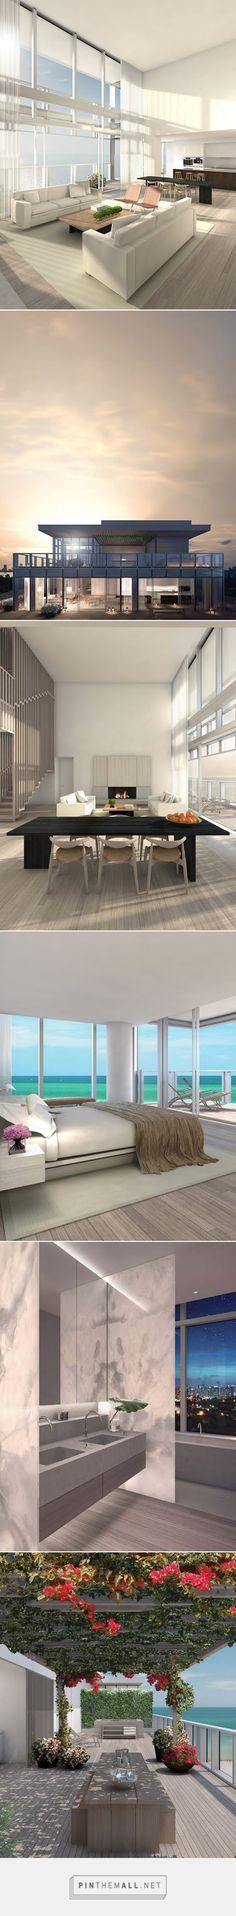 Miami Beach Edition Residences by John Pawson